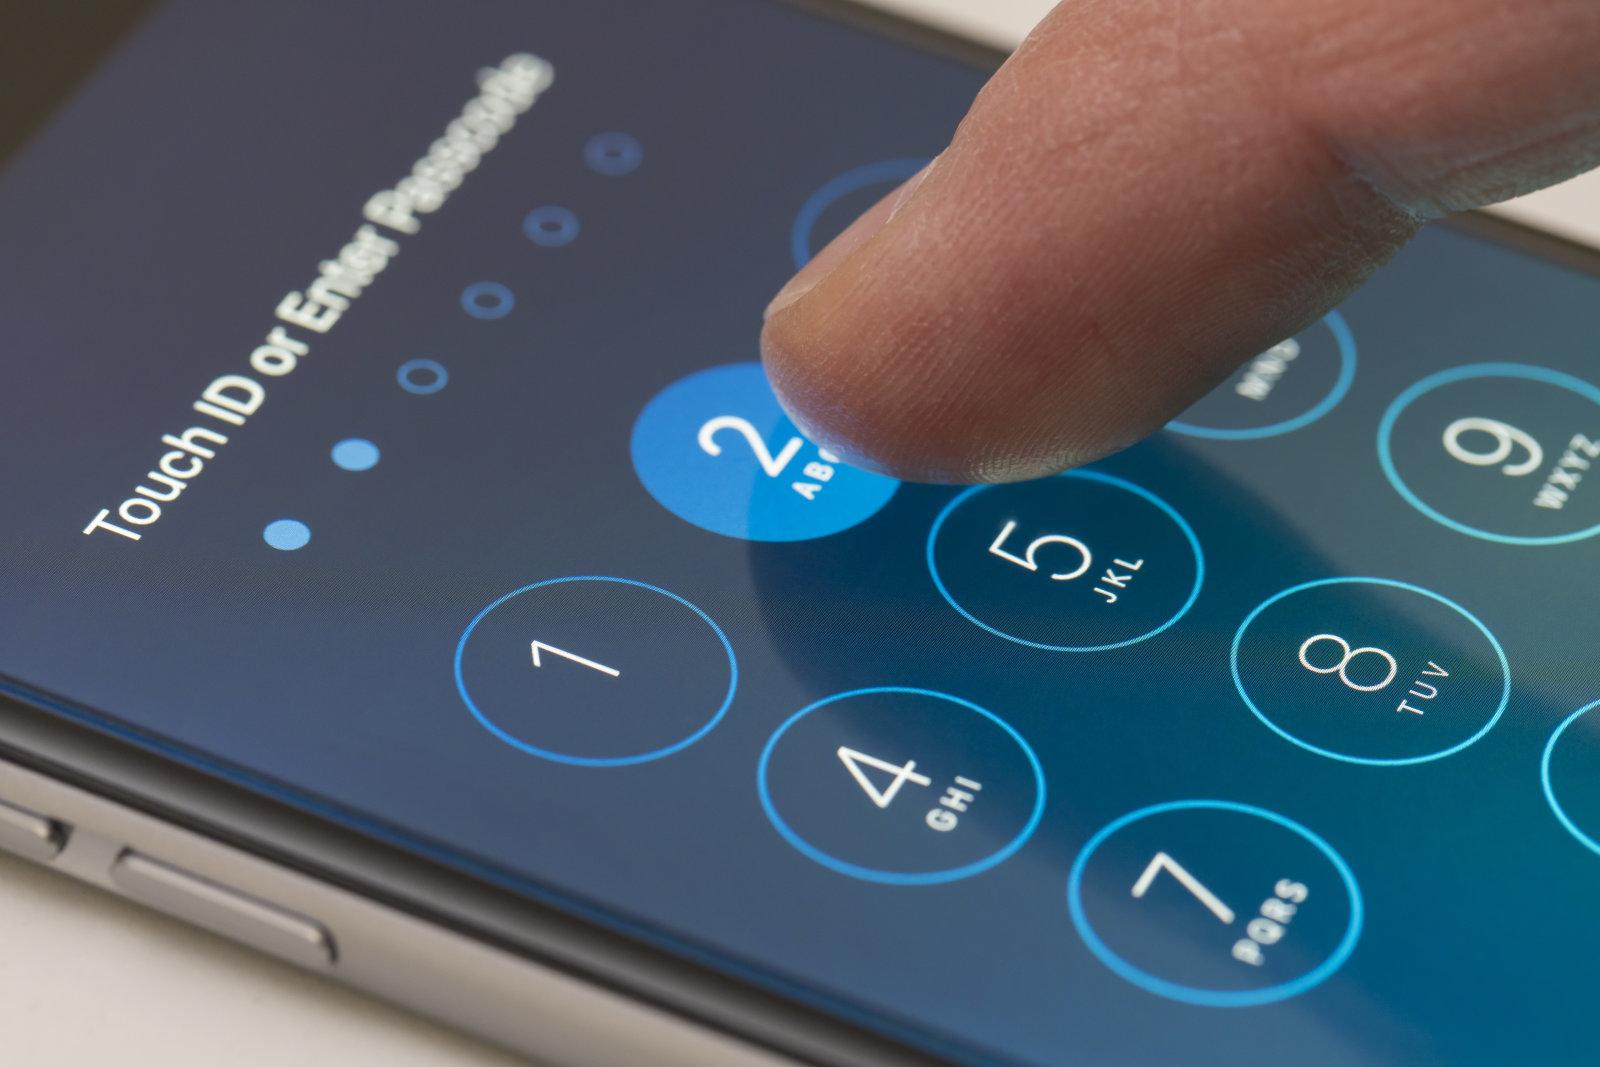 ميزة بنظام iOS 11 ستوقف عمل Touch ID